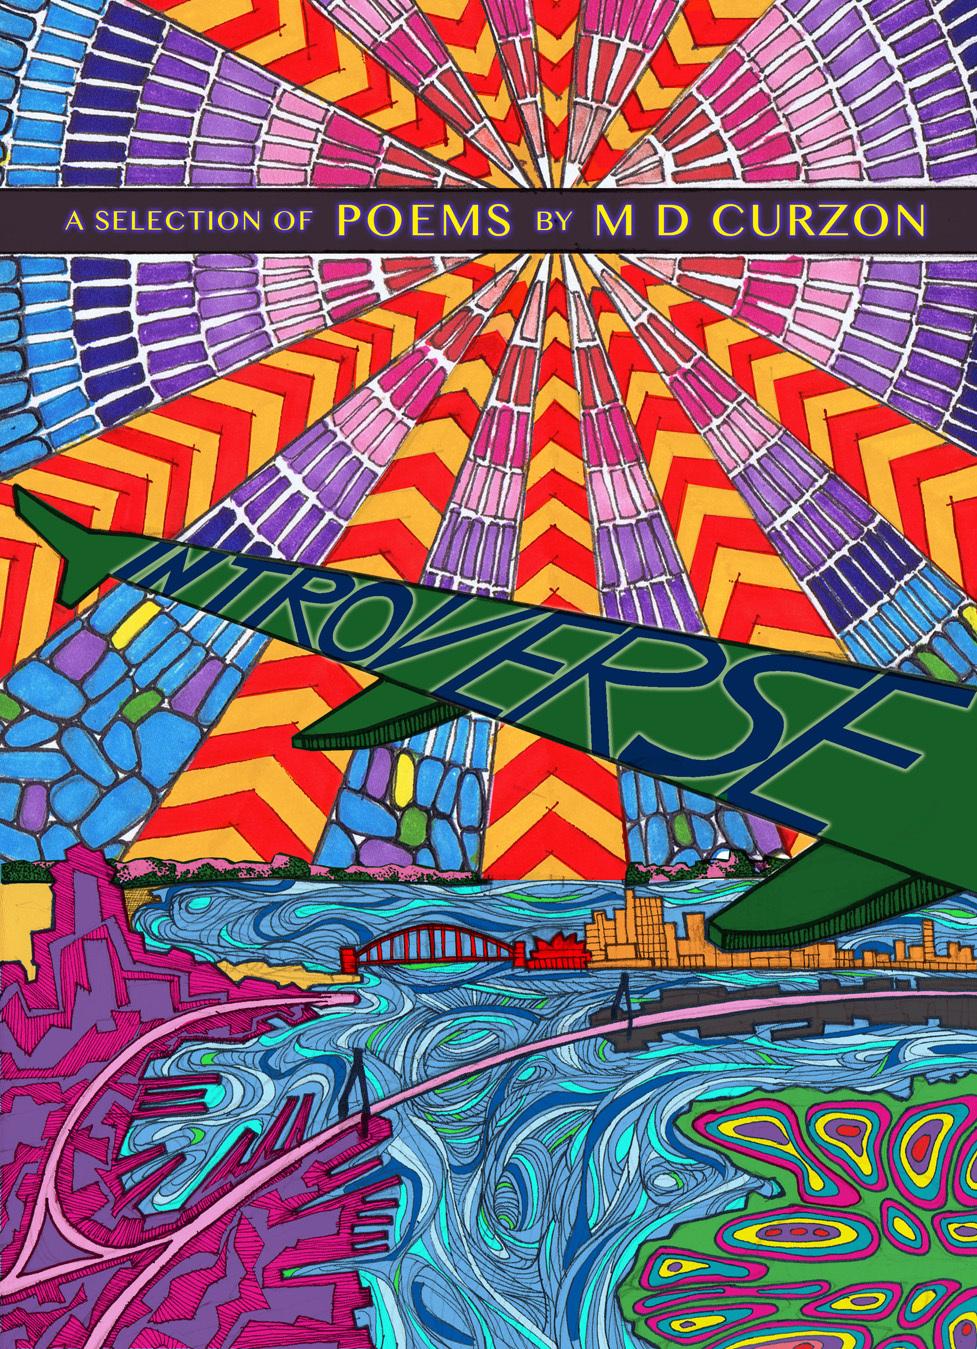 Introverse M.D. Curzon